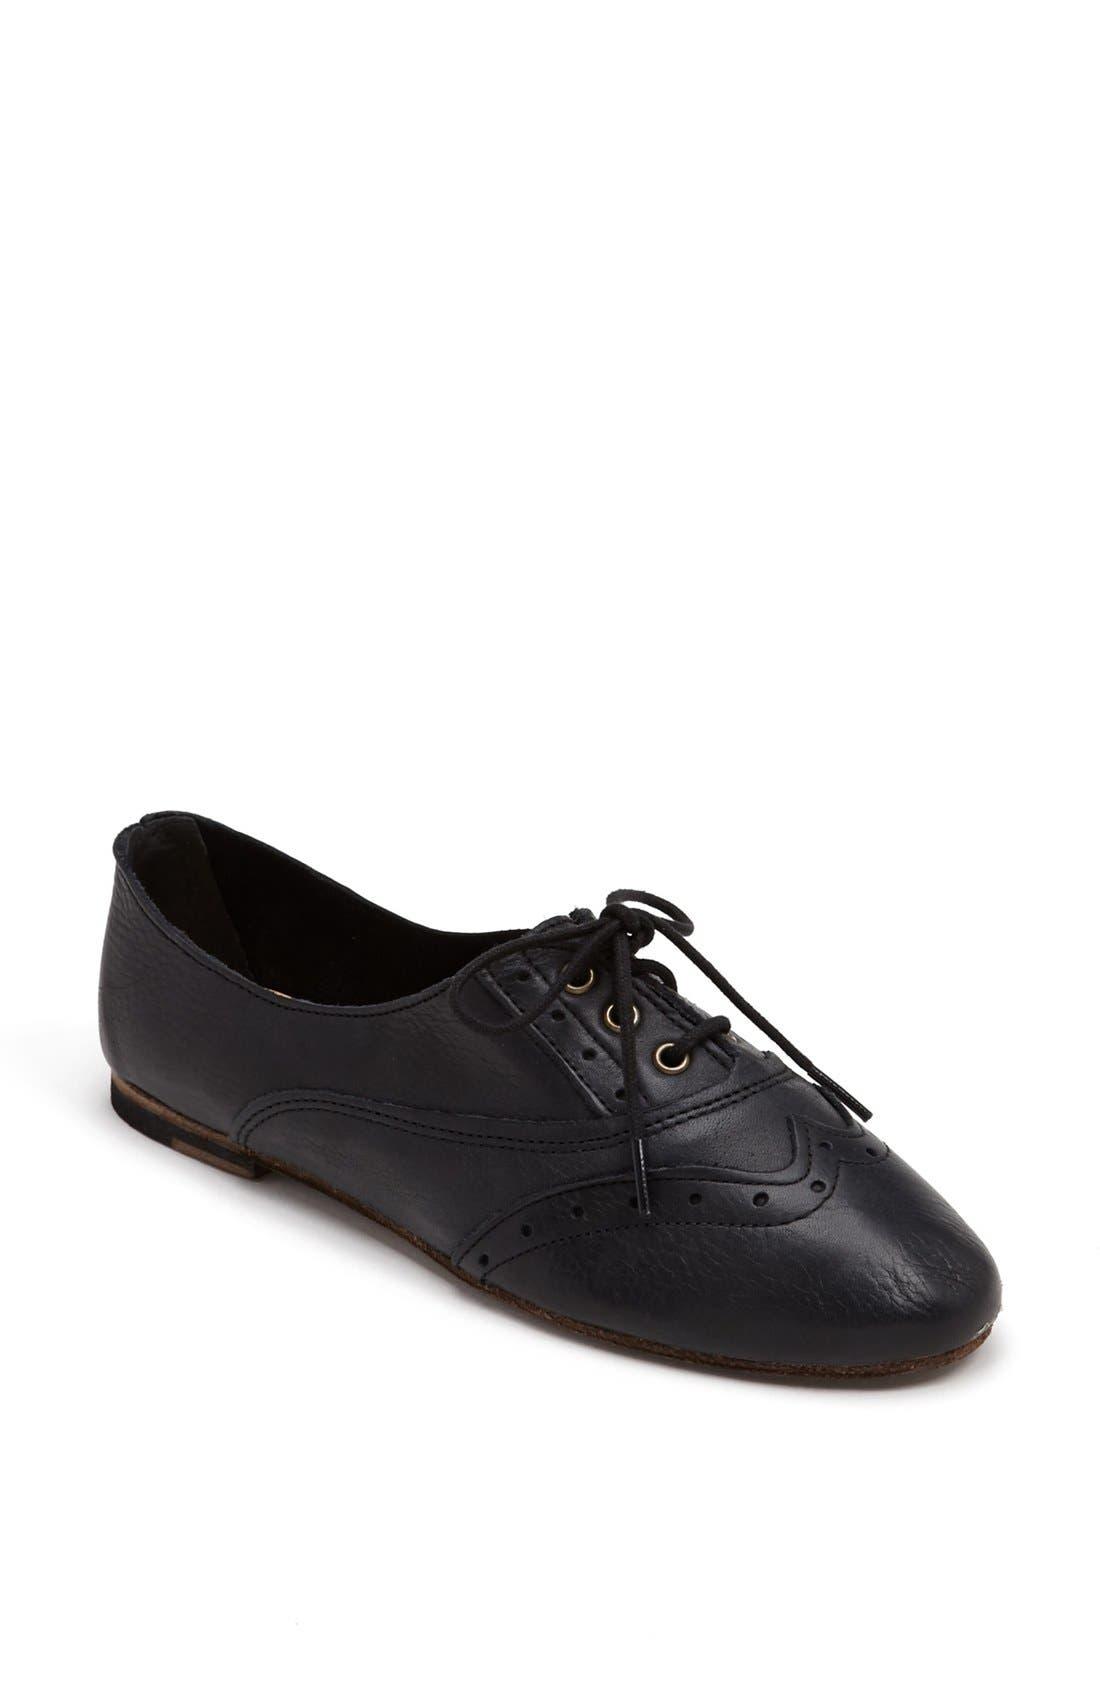 Main Image - Vintage Shoe Company 'Aubrey' Flat